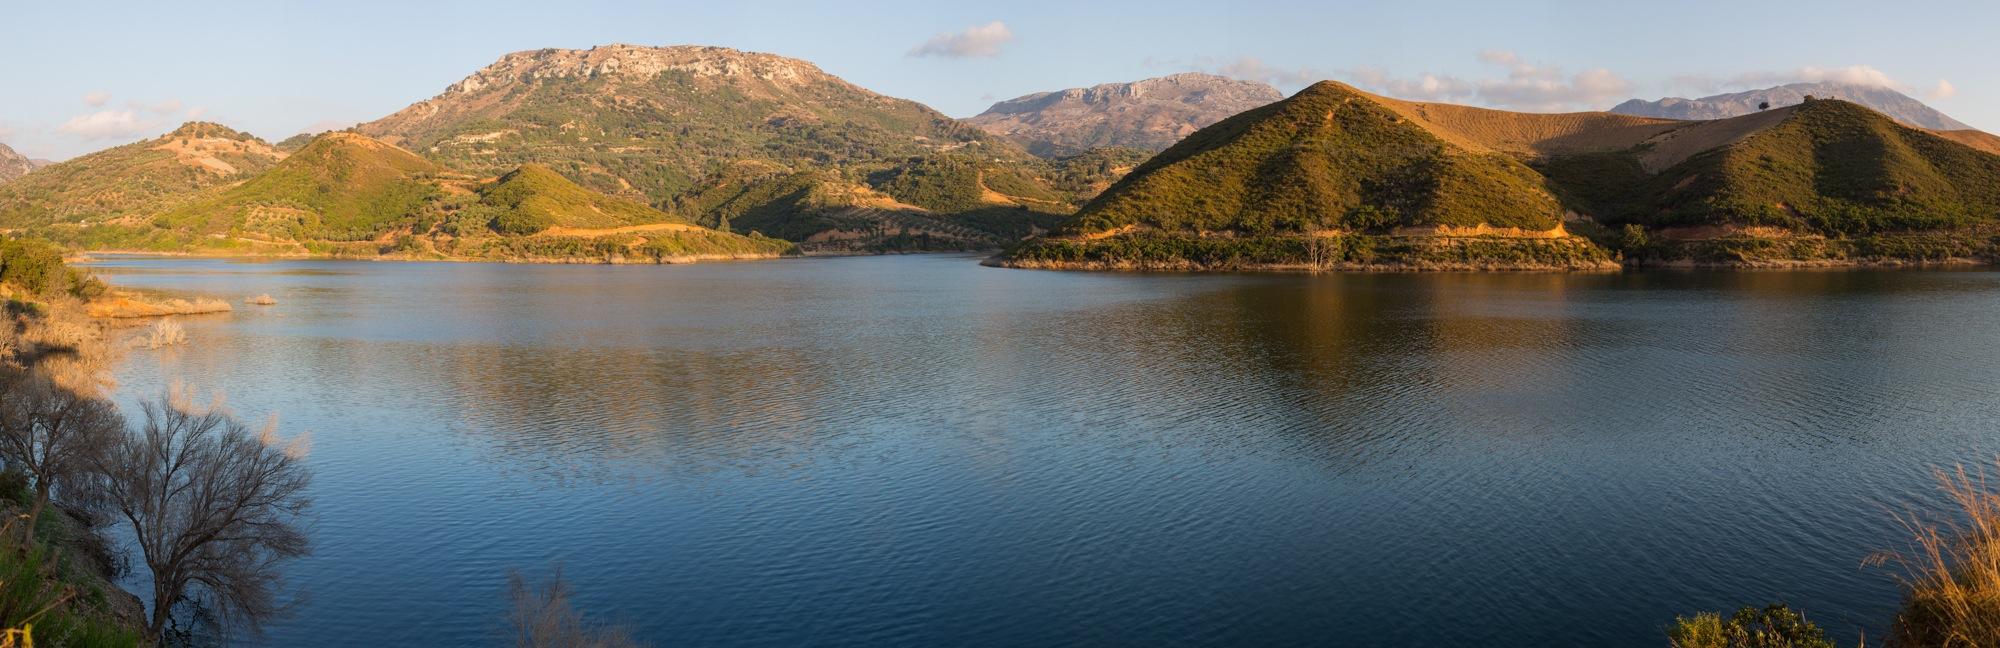 Berglandschaft auf Kreta